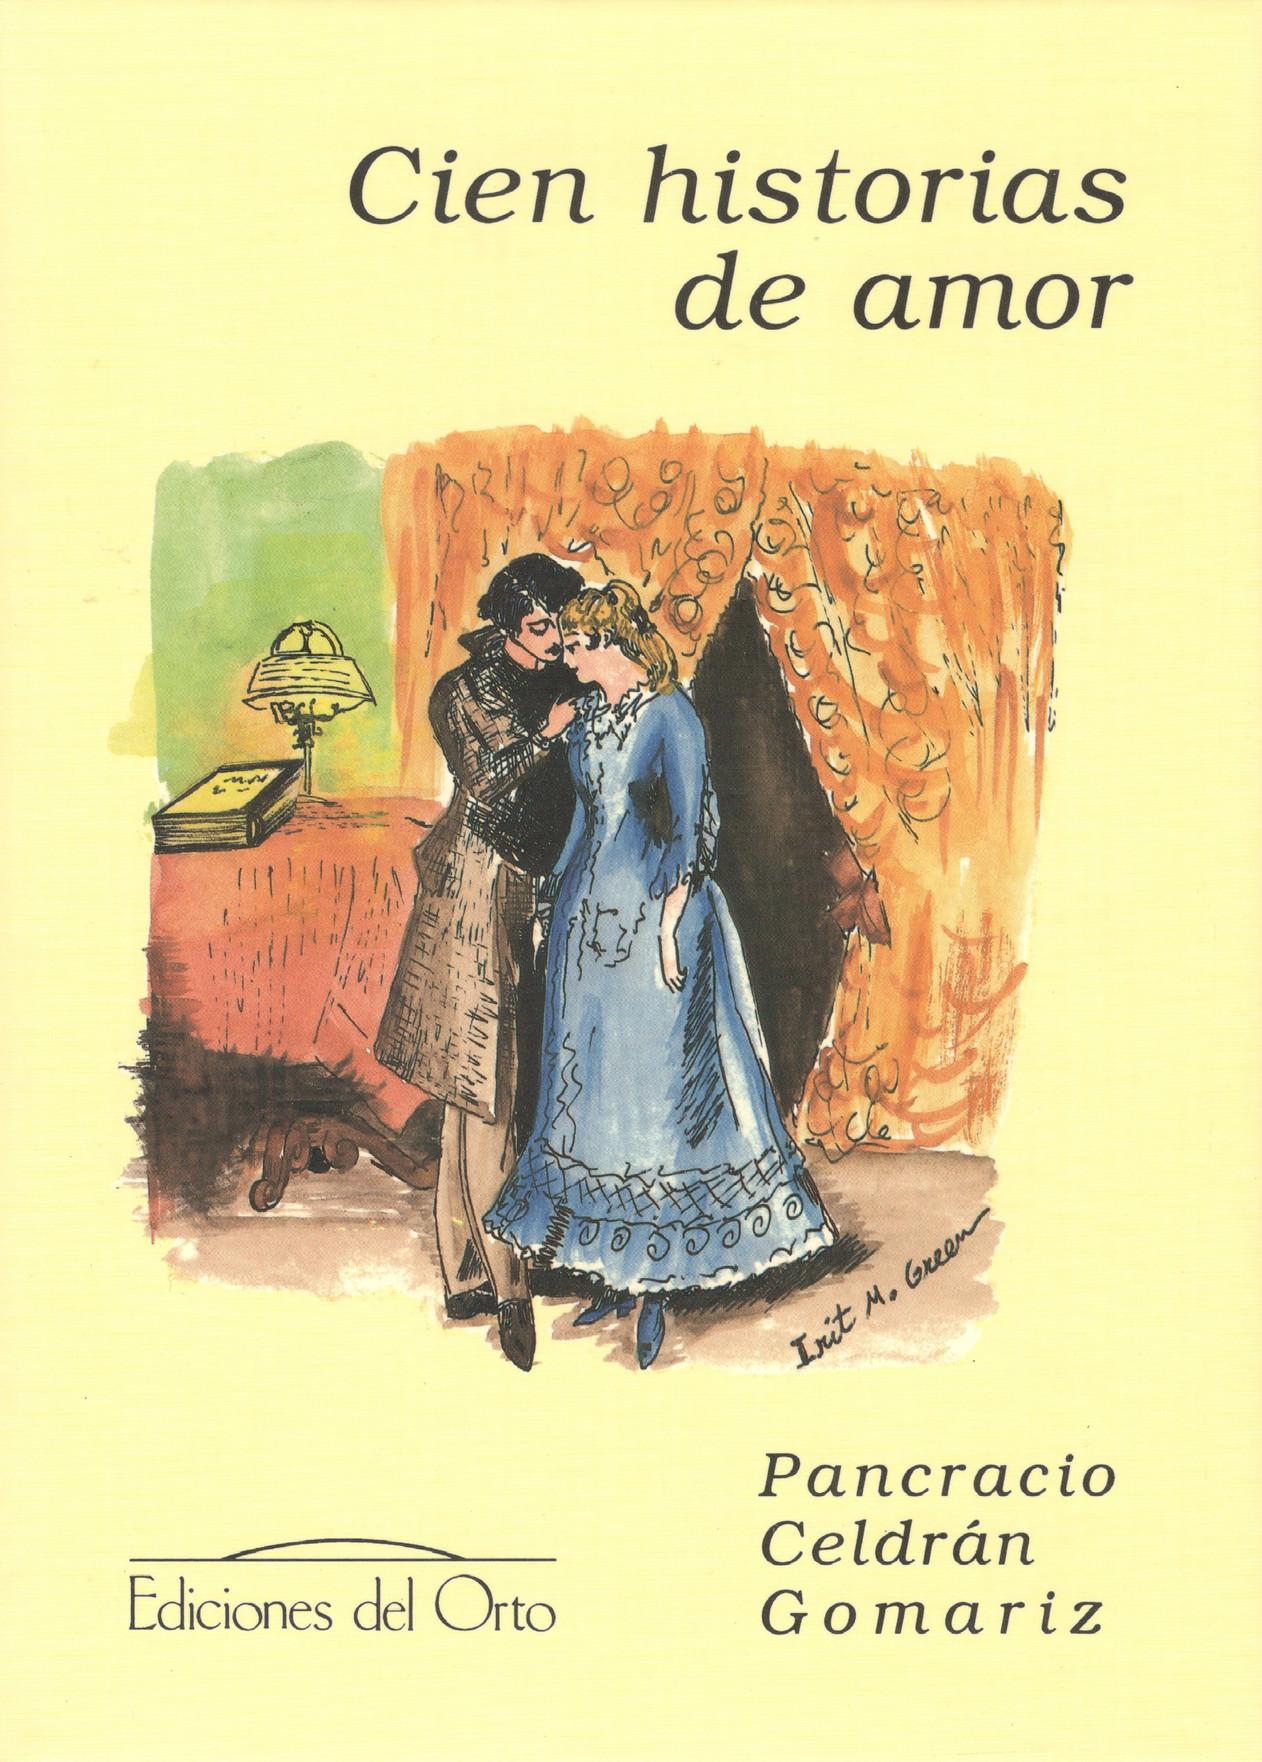 CIEN HISTORIAS DE AMOR